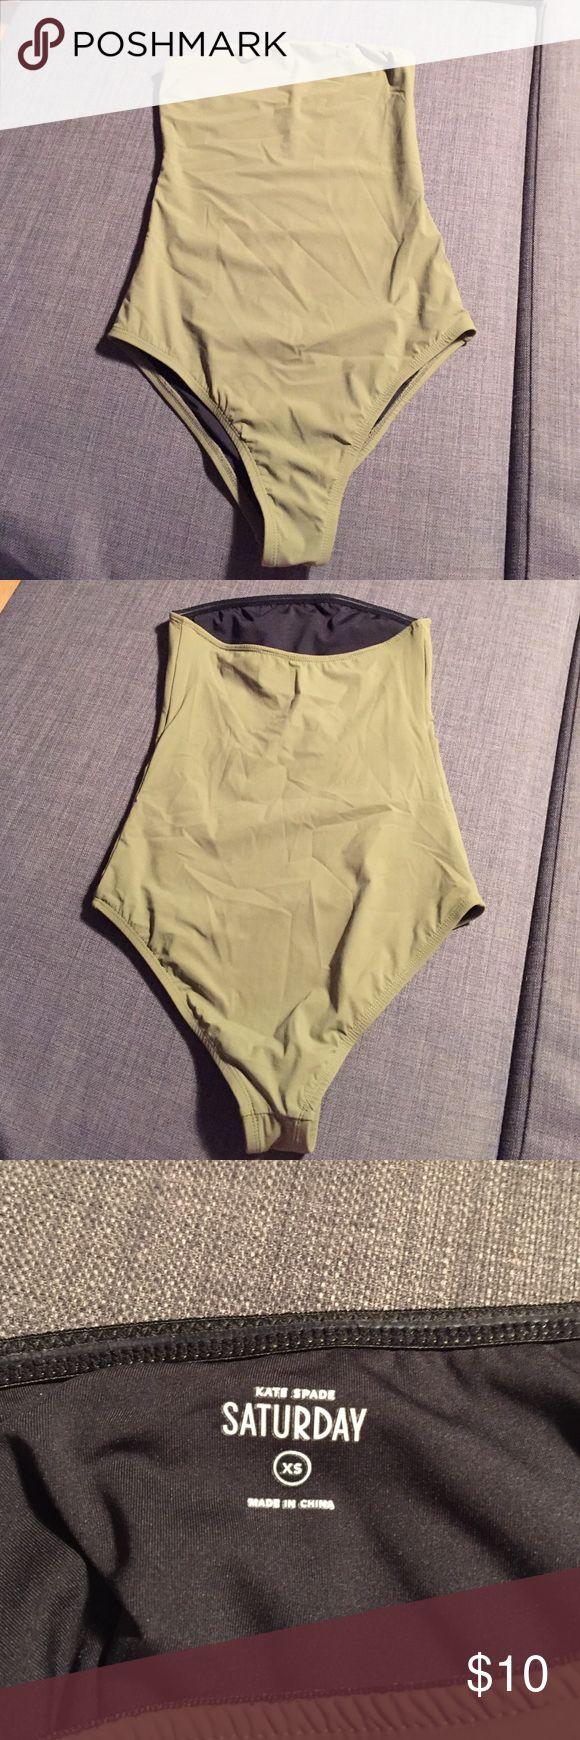 Kate Spade Saturday ..One piece bathing suit Olive green Kate Spade Saturday one piece bathing suite. Never worn ! Slimming bathing suit. Kate Spade Saturday Swim One Pieces